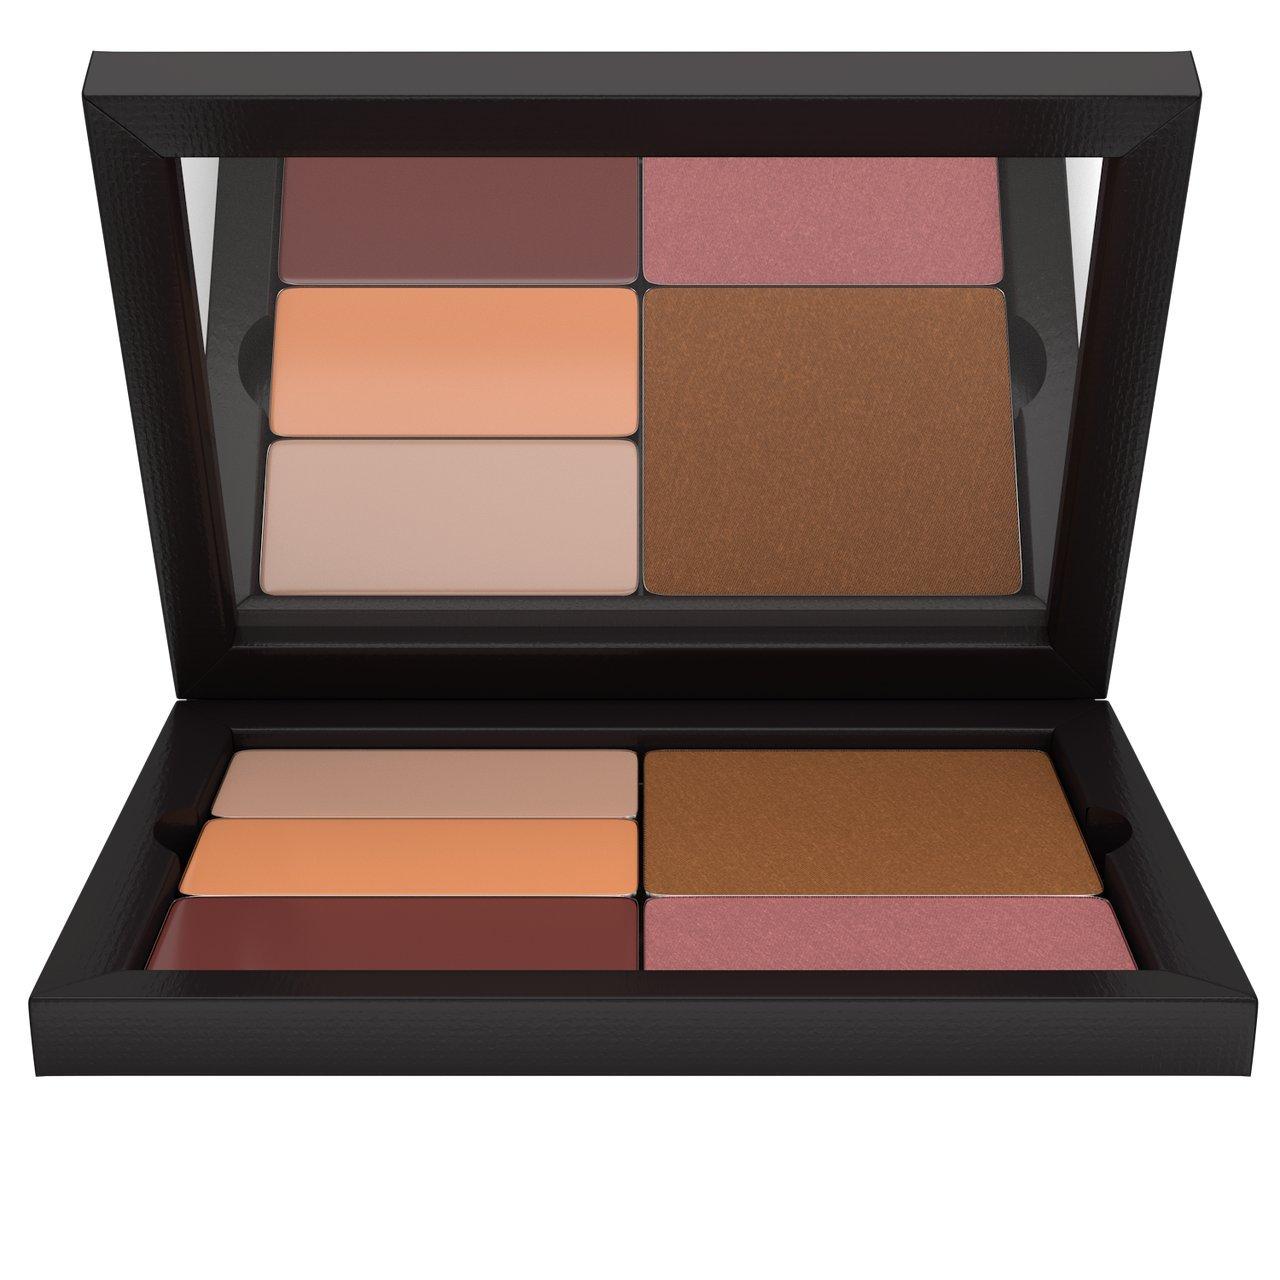 Contour/Highlight Blush Bronzer Makeup Palette: Medium Complexion